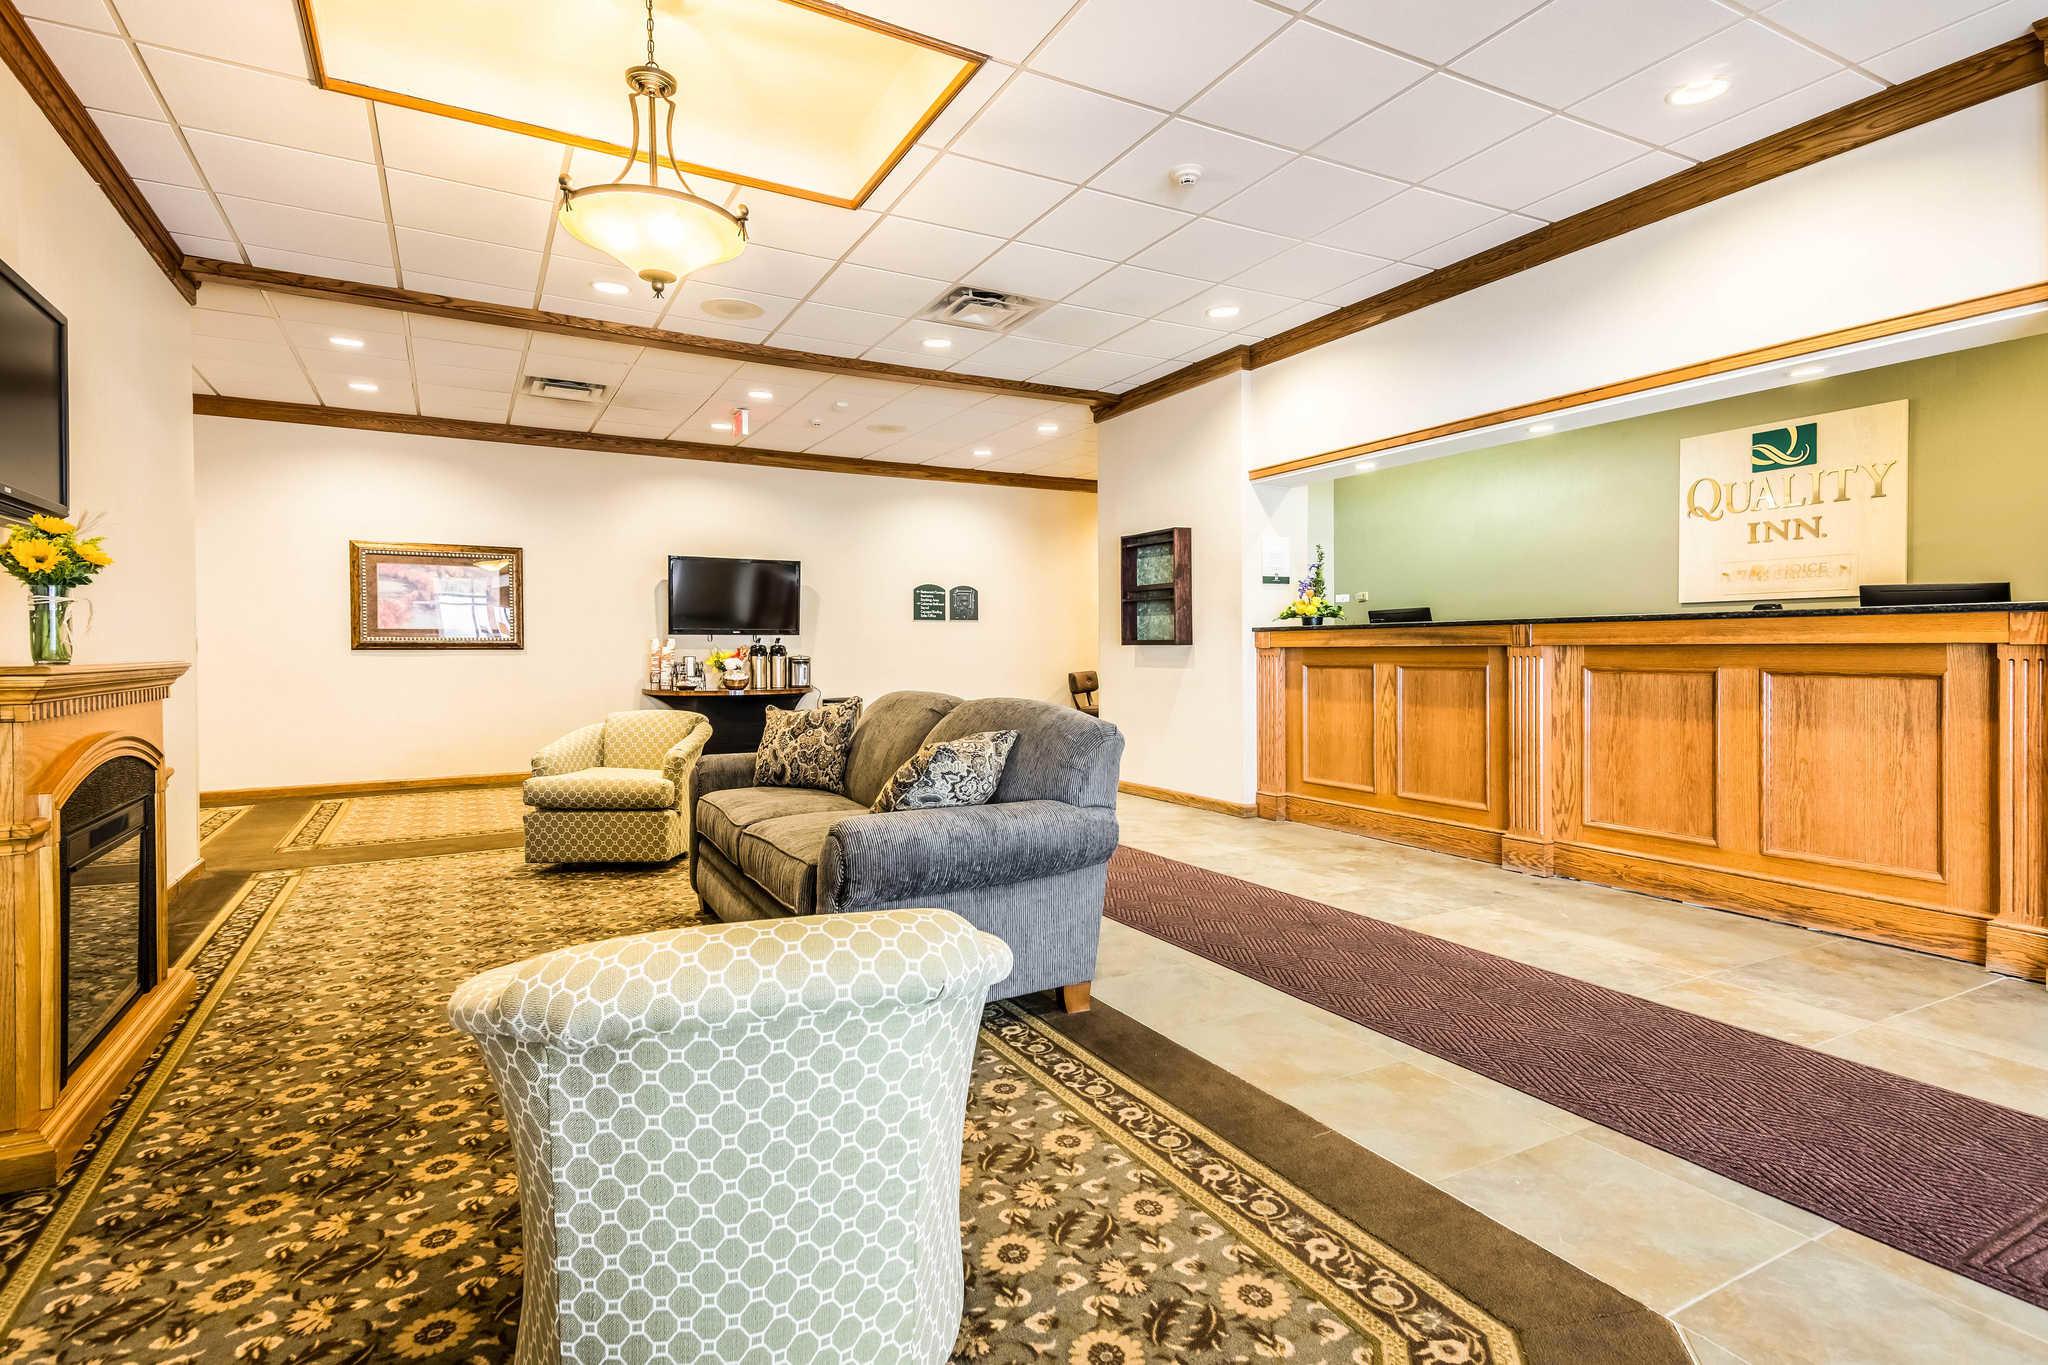 Quality Inn near Finger Lakes and Seneca Falls image 0